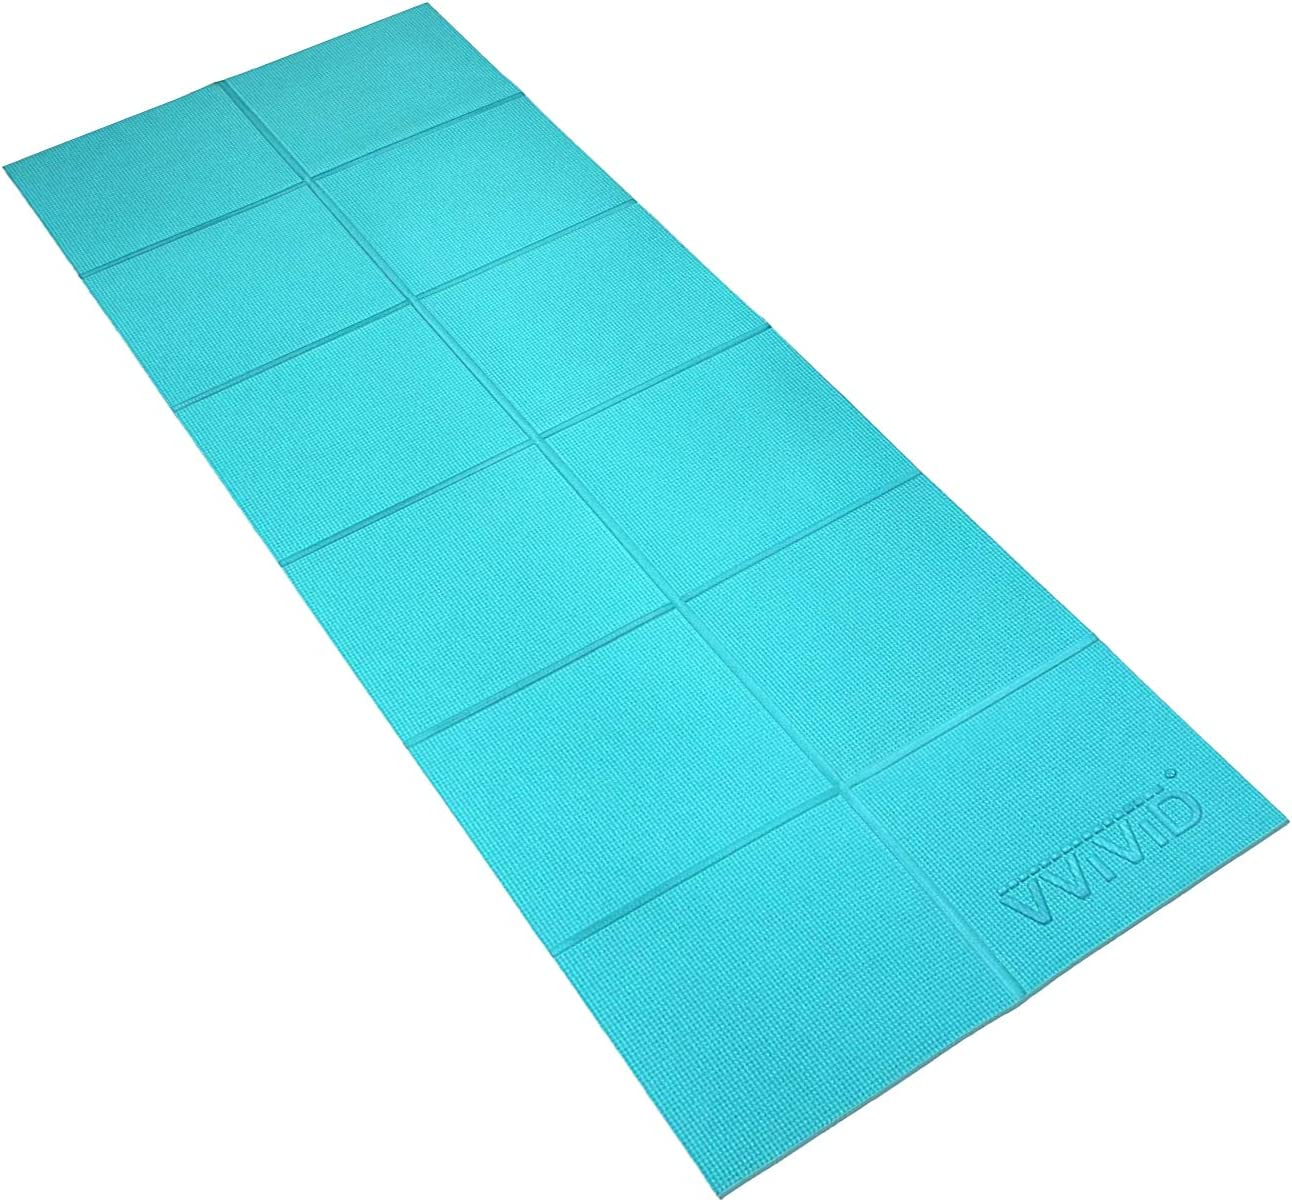 Tri-Fold Folding Exercise Mat Yoga//Pilates//Gym Class Workout//Fitness 5CM Sky Blu